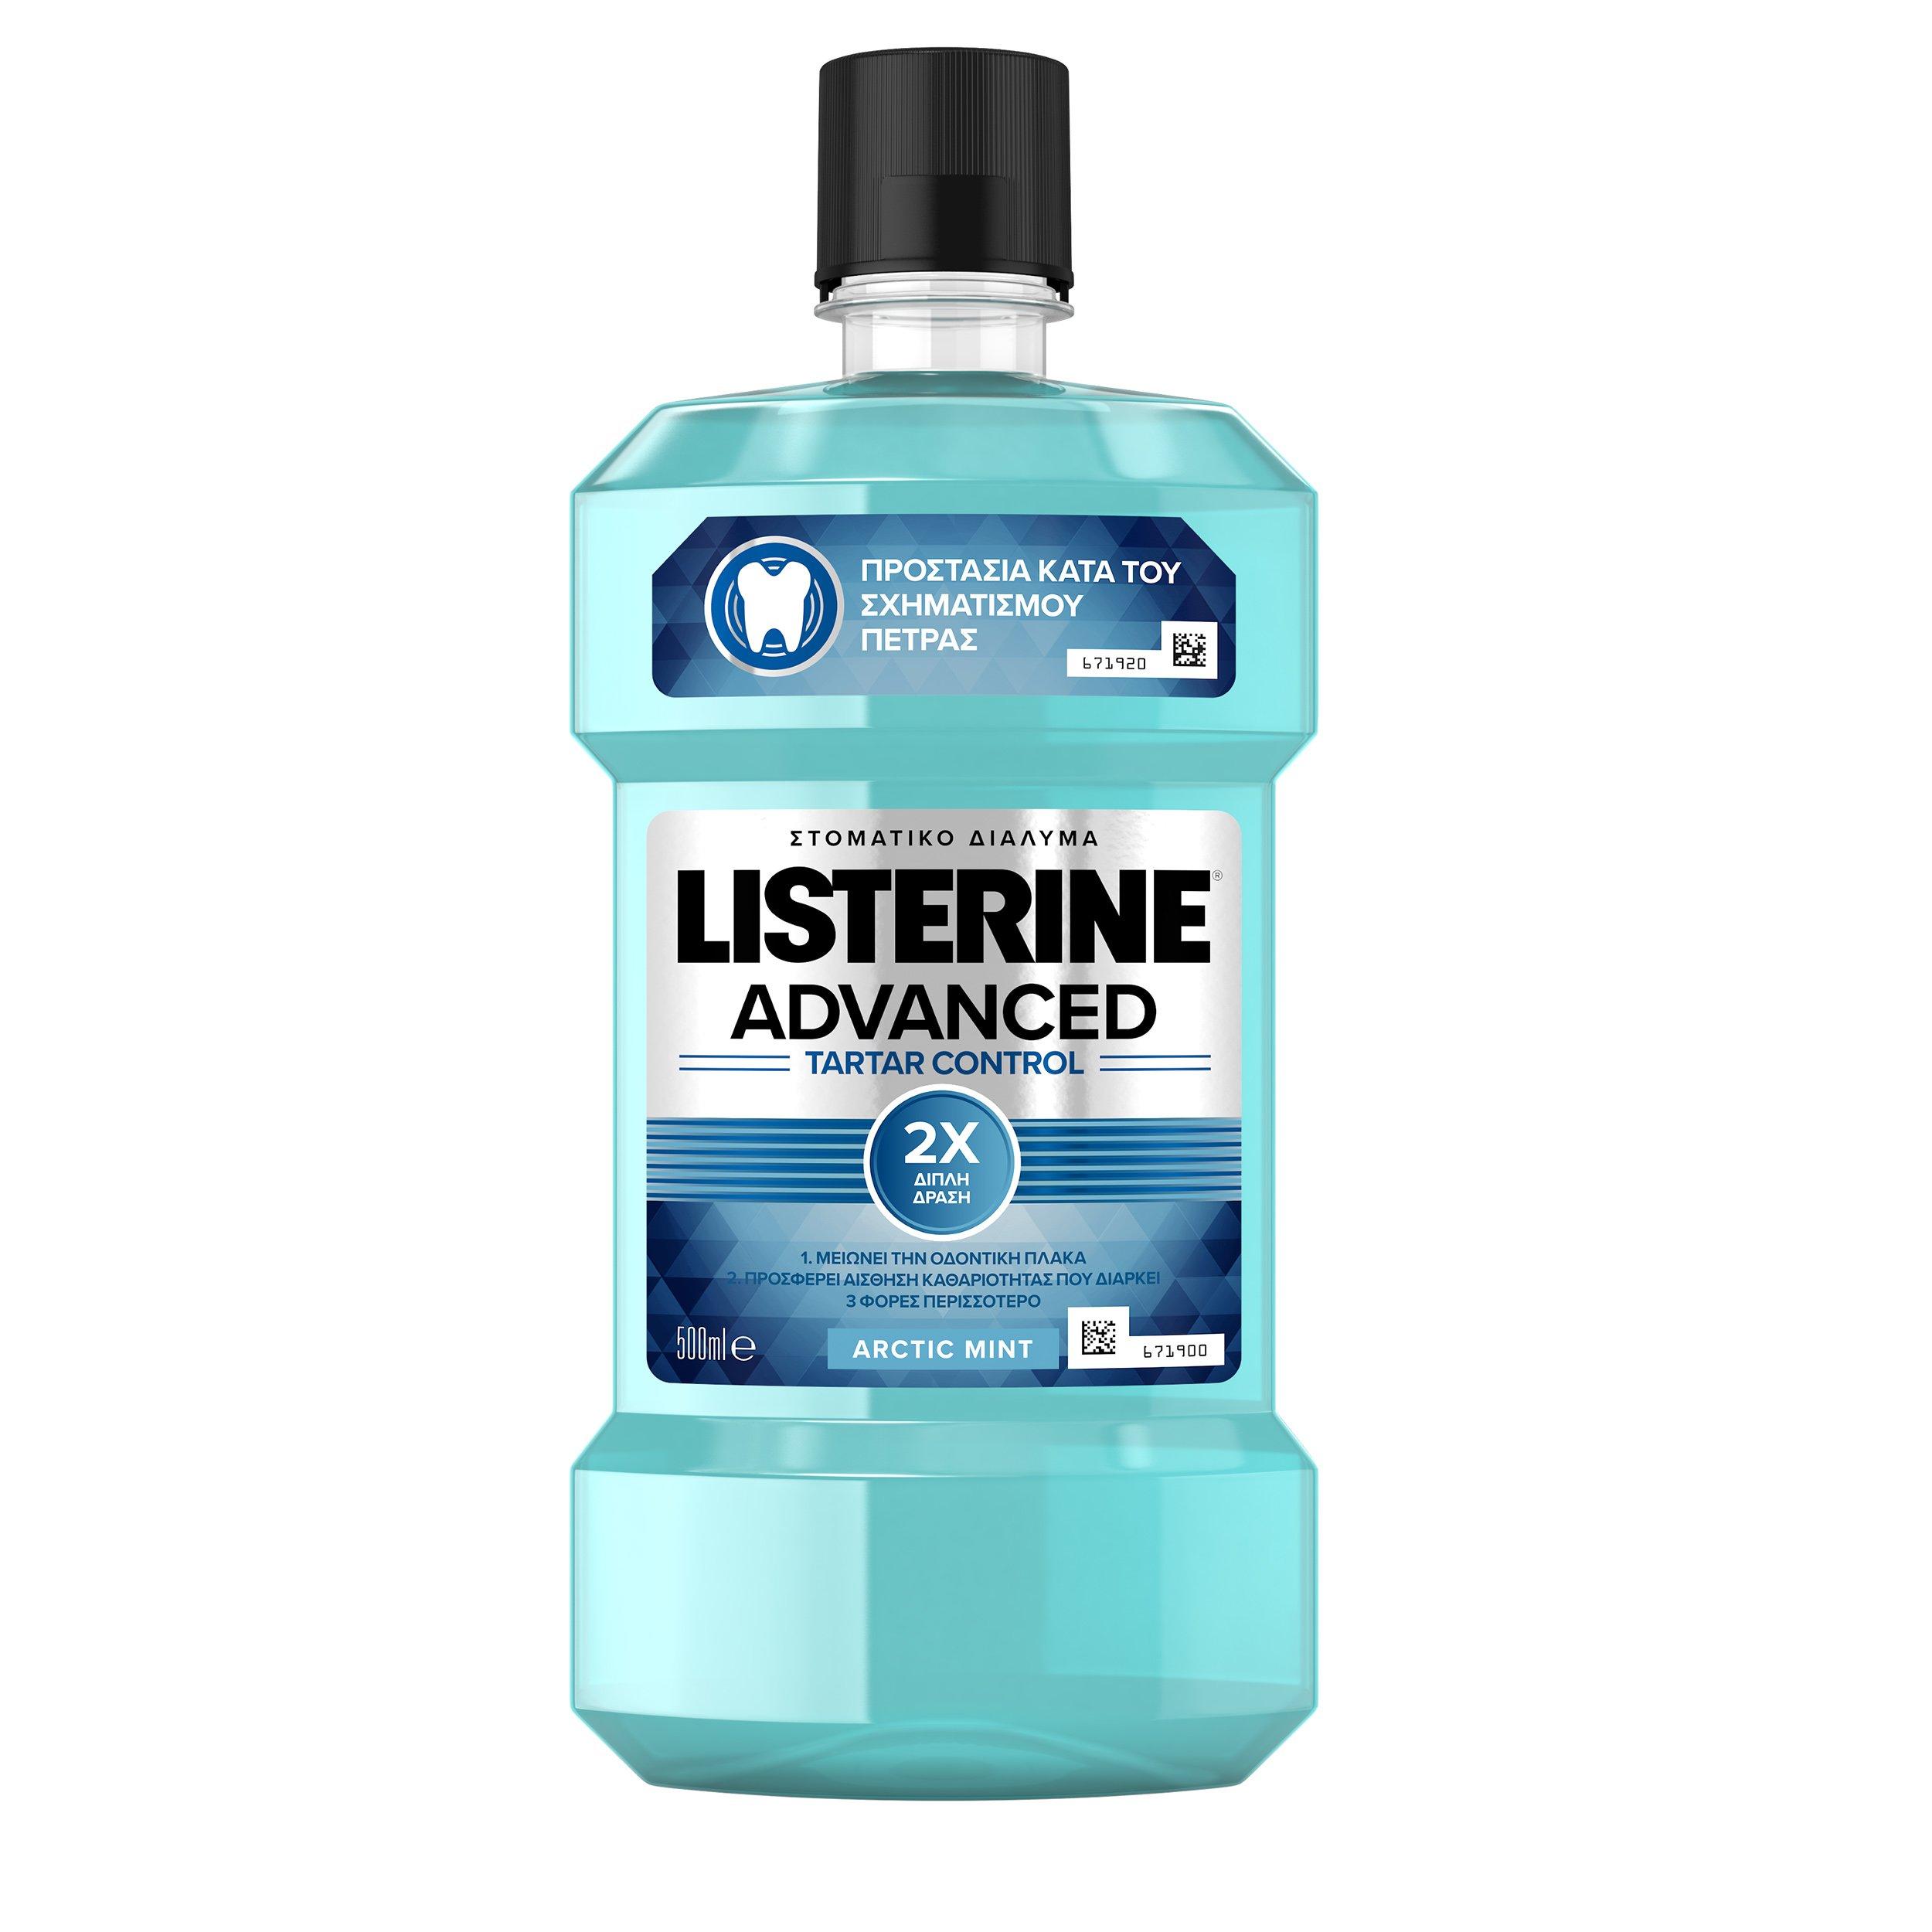 Listerine Advanced Tartar Control Στοματικό Διάλυμα για Πρόληψη και Καταπολέμηση της Πλάκας και της Πέτρας 500ml